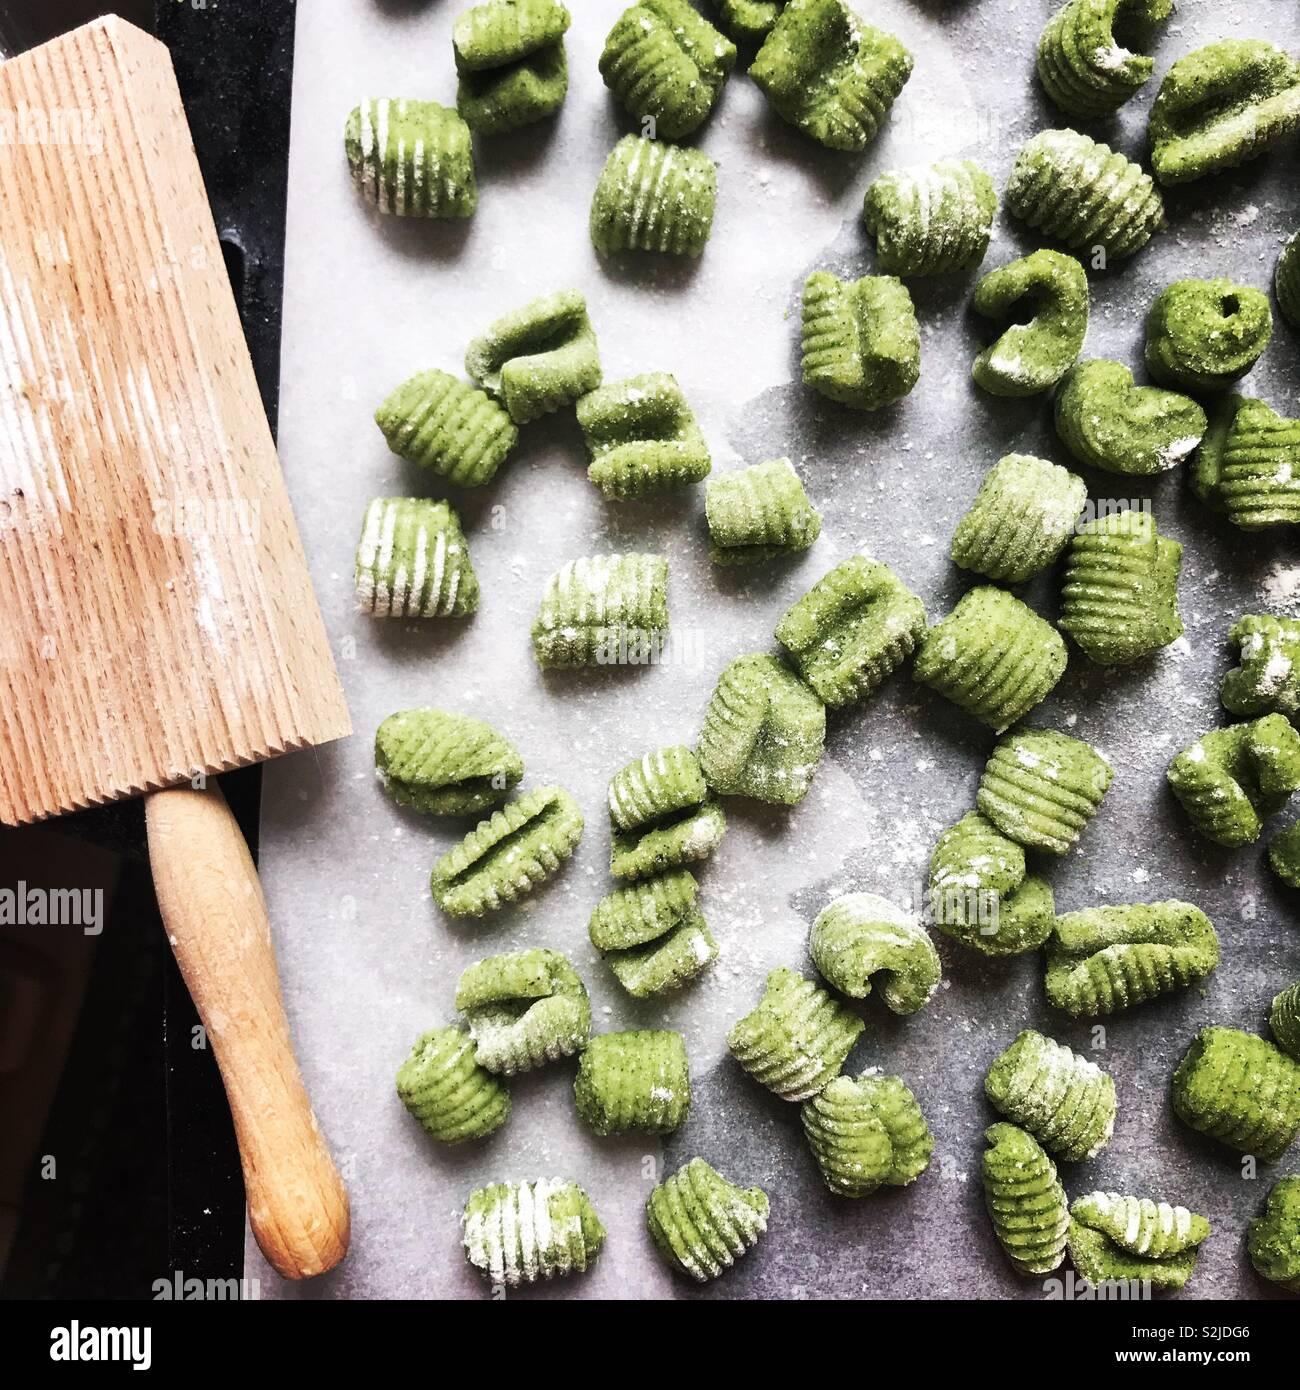 Toronto, mi cocina, 2018, de la mano Imagen De Stock